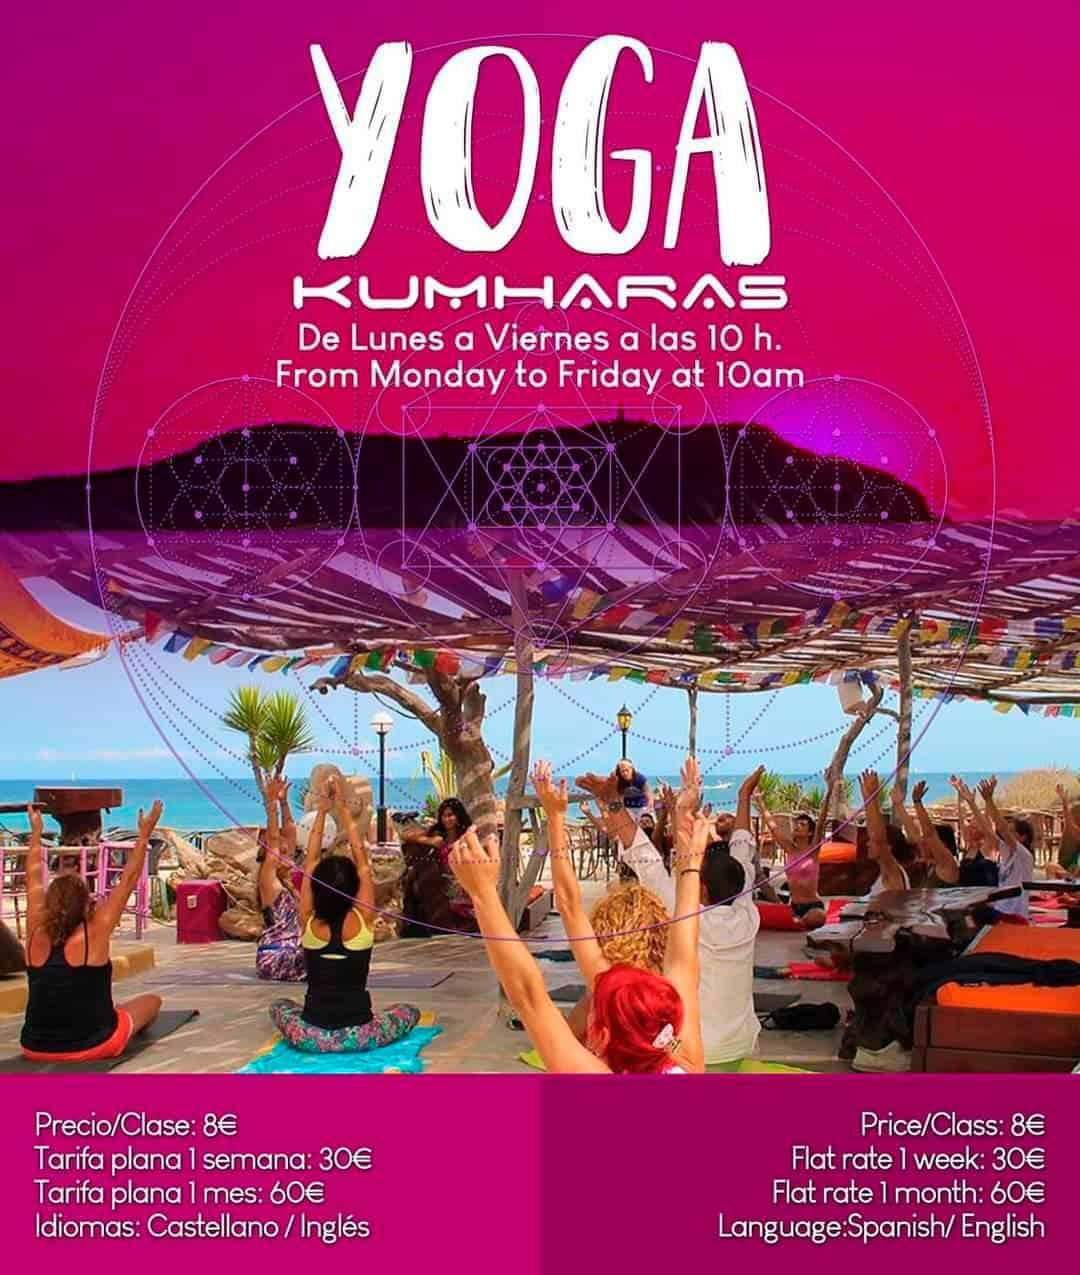 ioga-Kumharas-Eivissa-2021-welcometoibiza